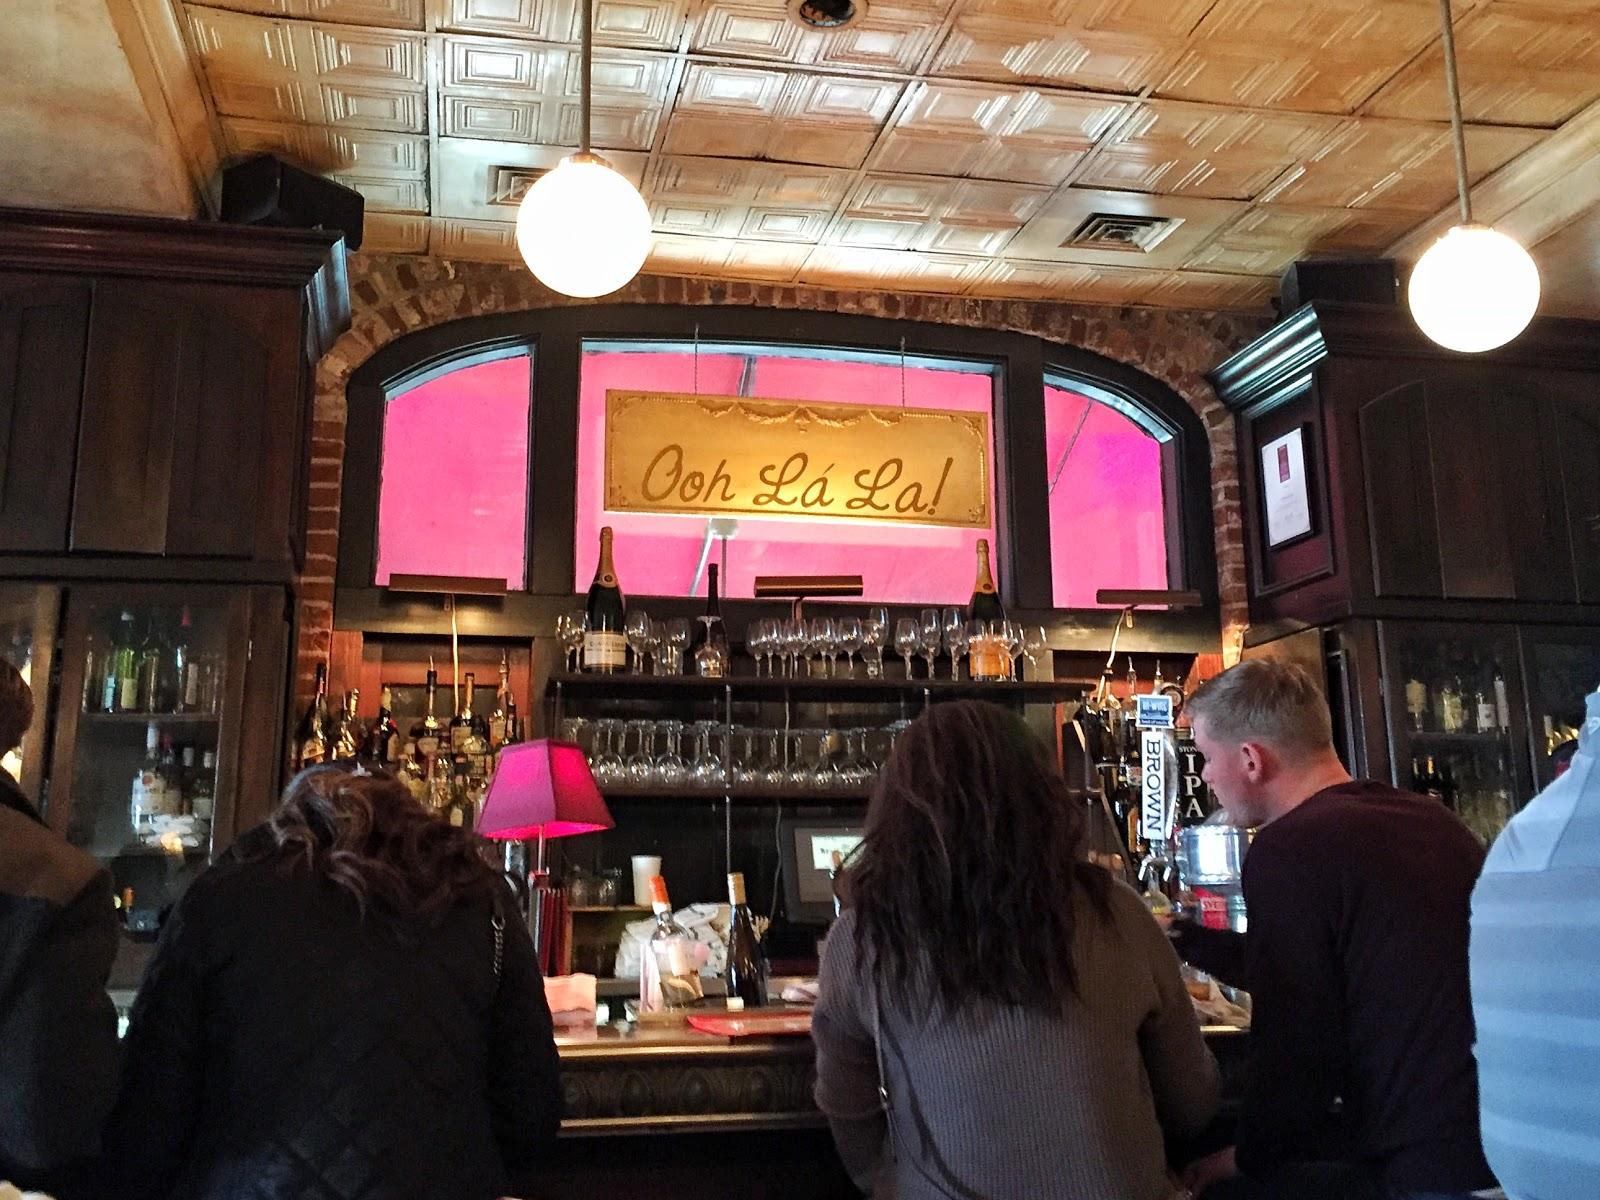 39 rue de jean downtown charleston south carolina bar restaurant upper king brunch